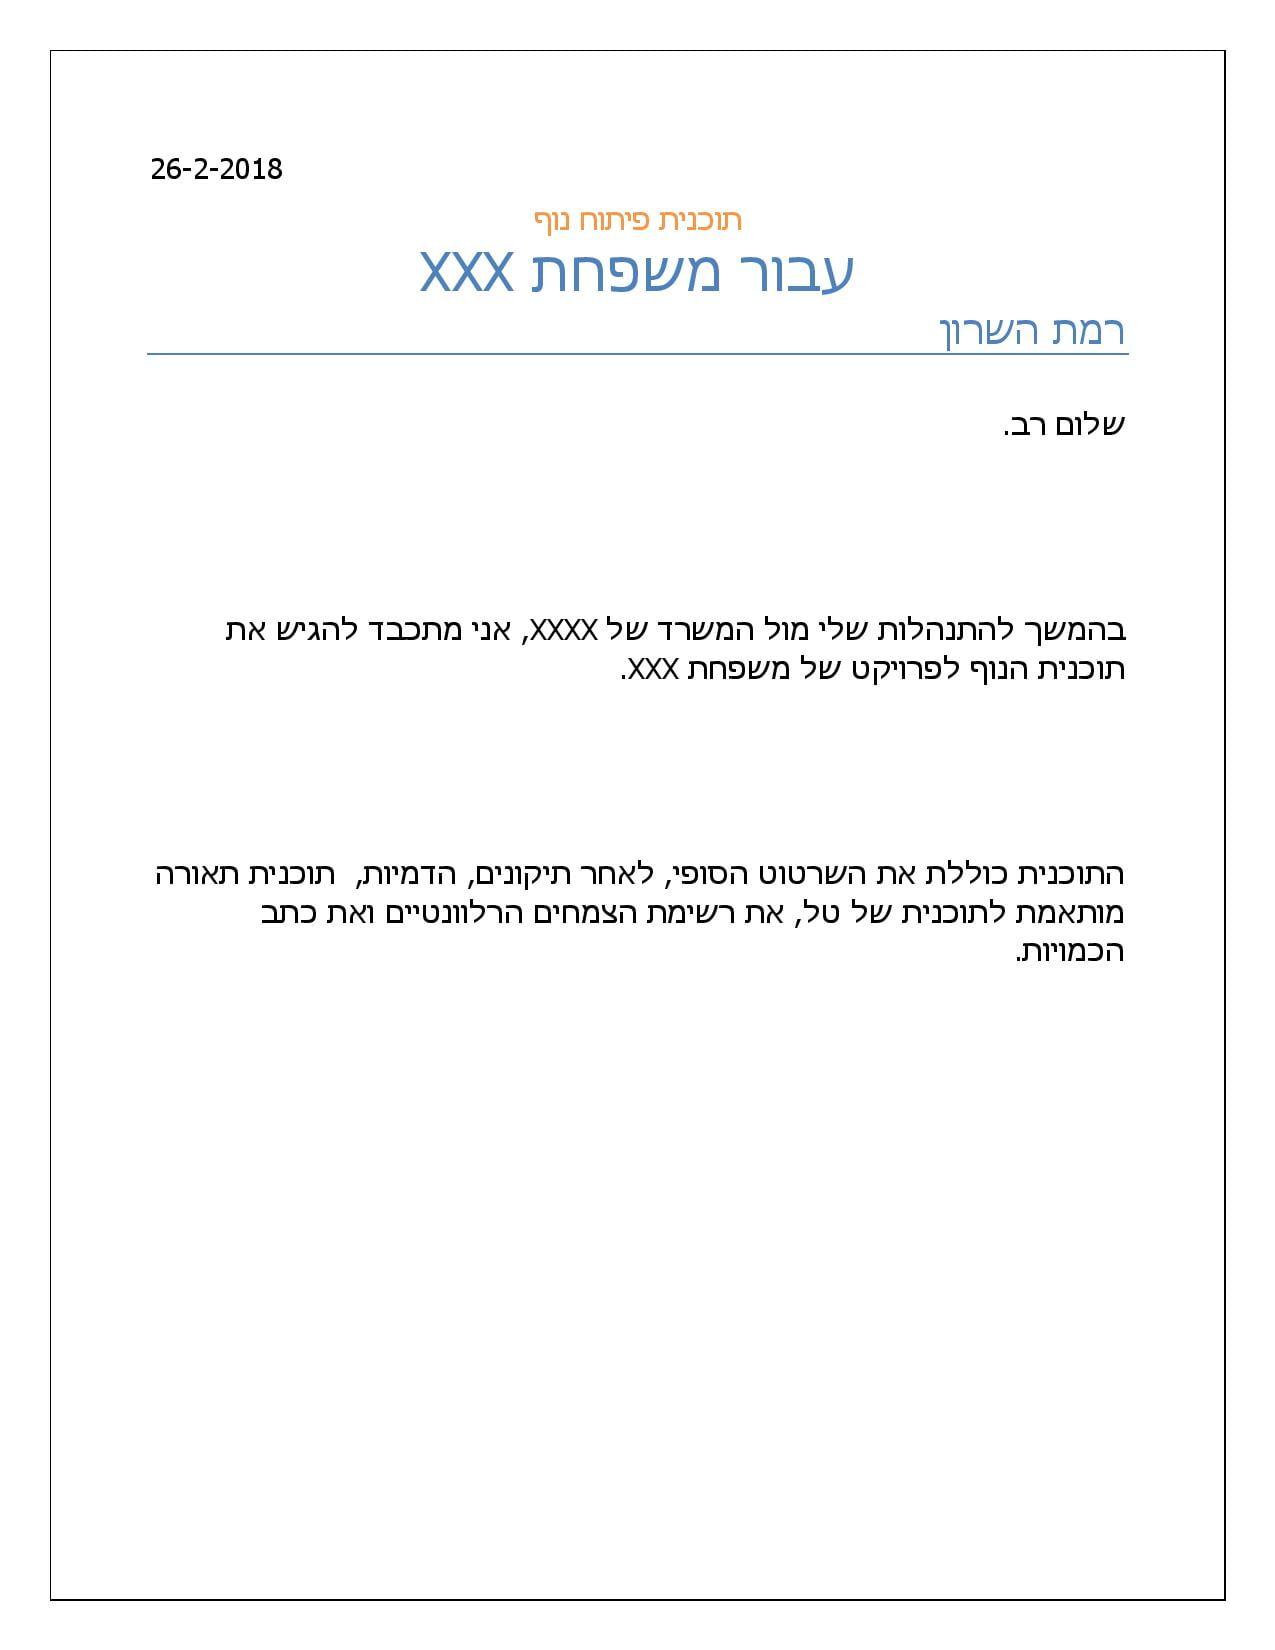 Document page 001 - דוגמא להצעת מחיר עבור עיצוב גינה